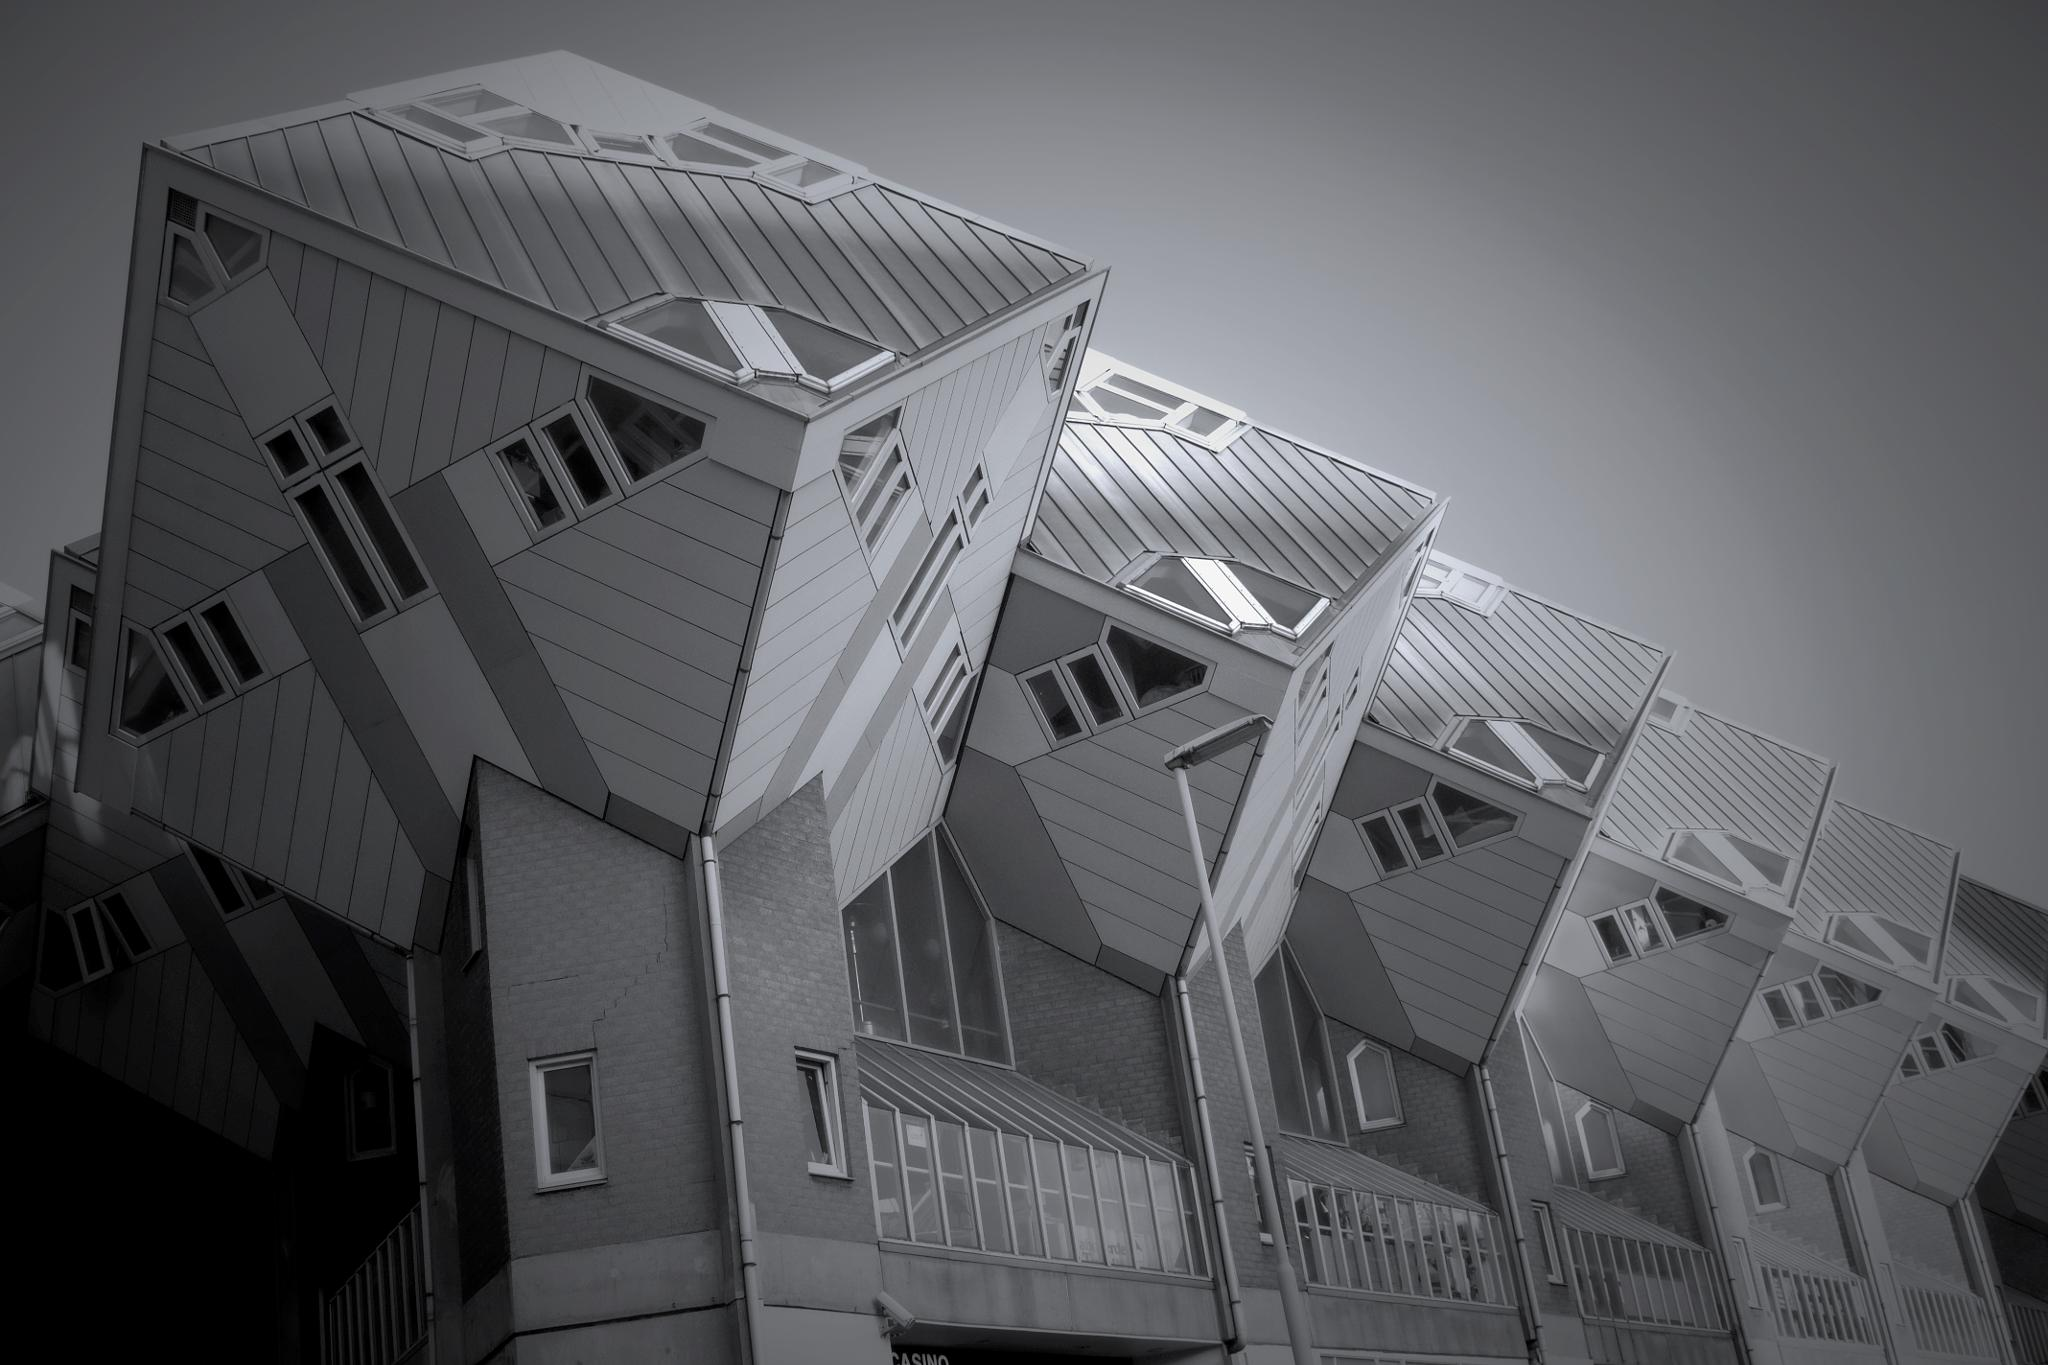 weird buildings by markcauchi